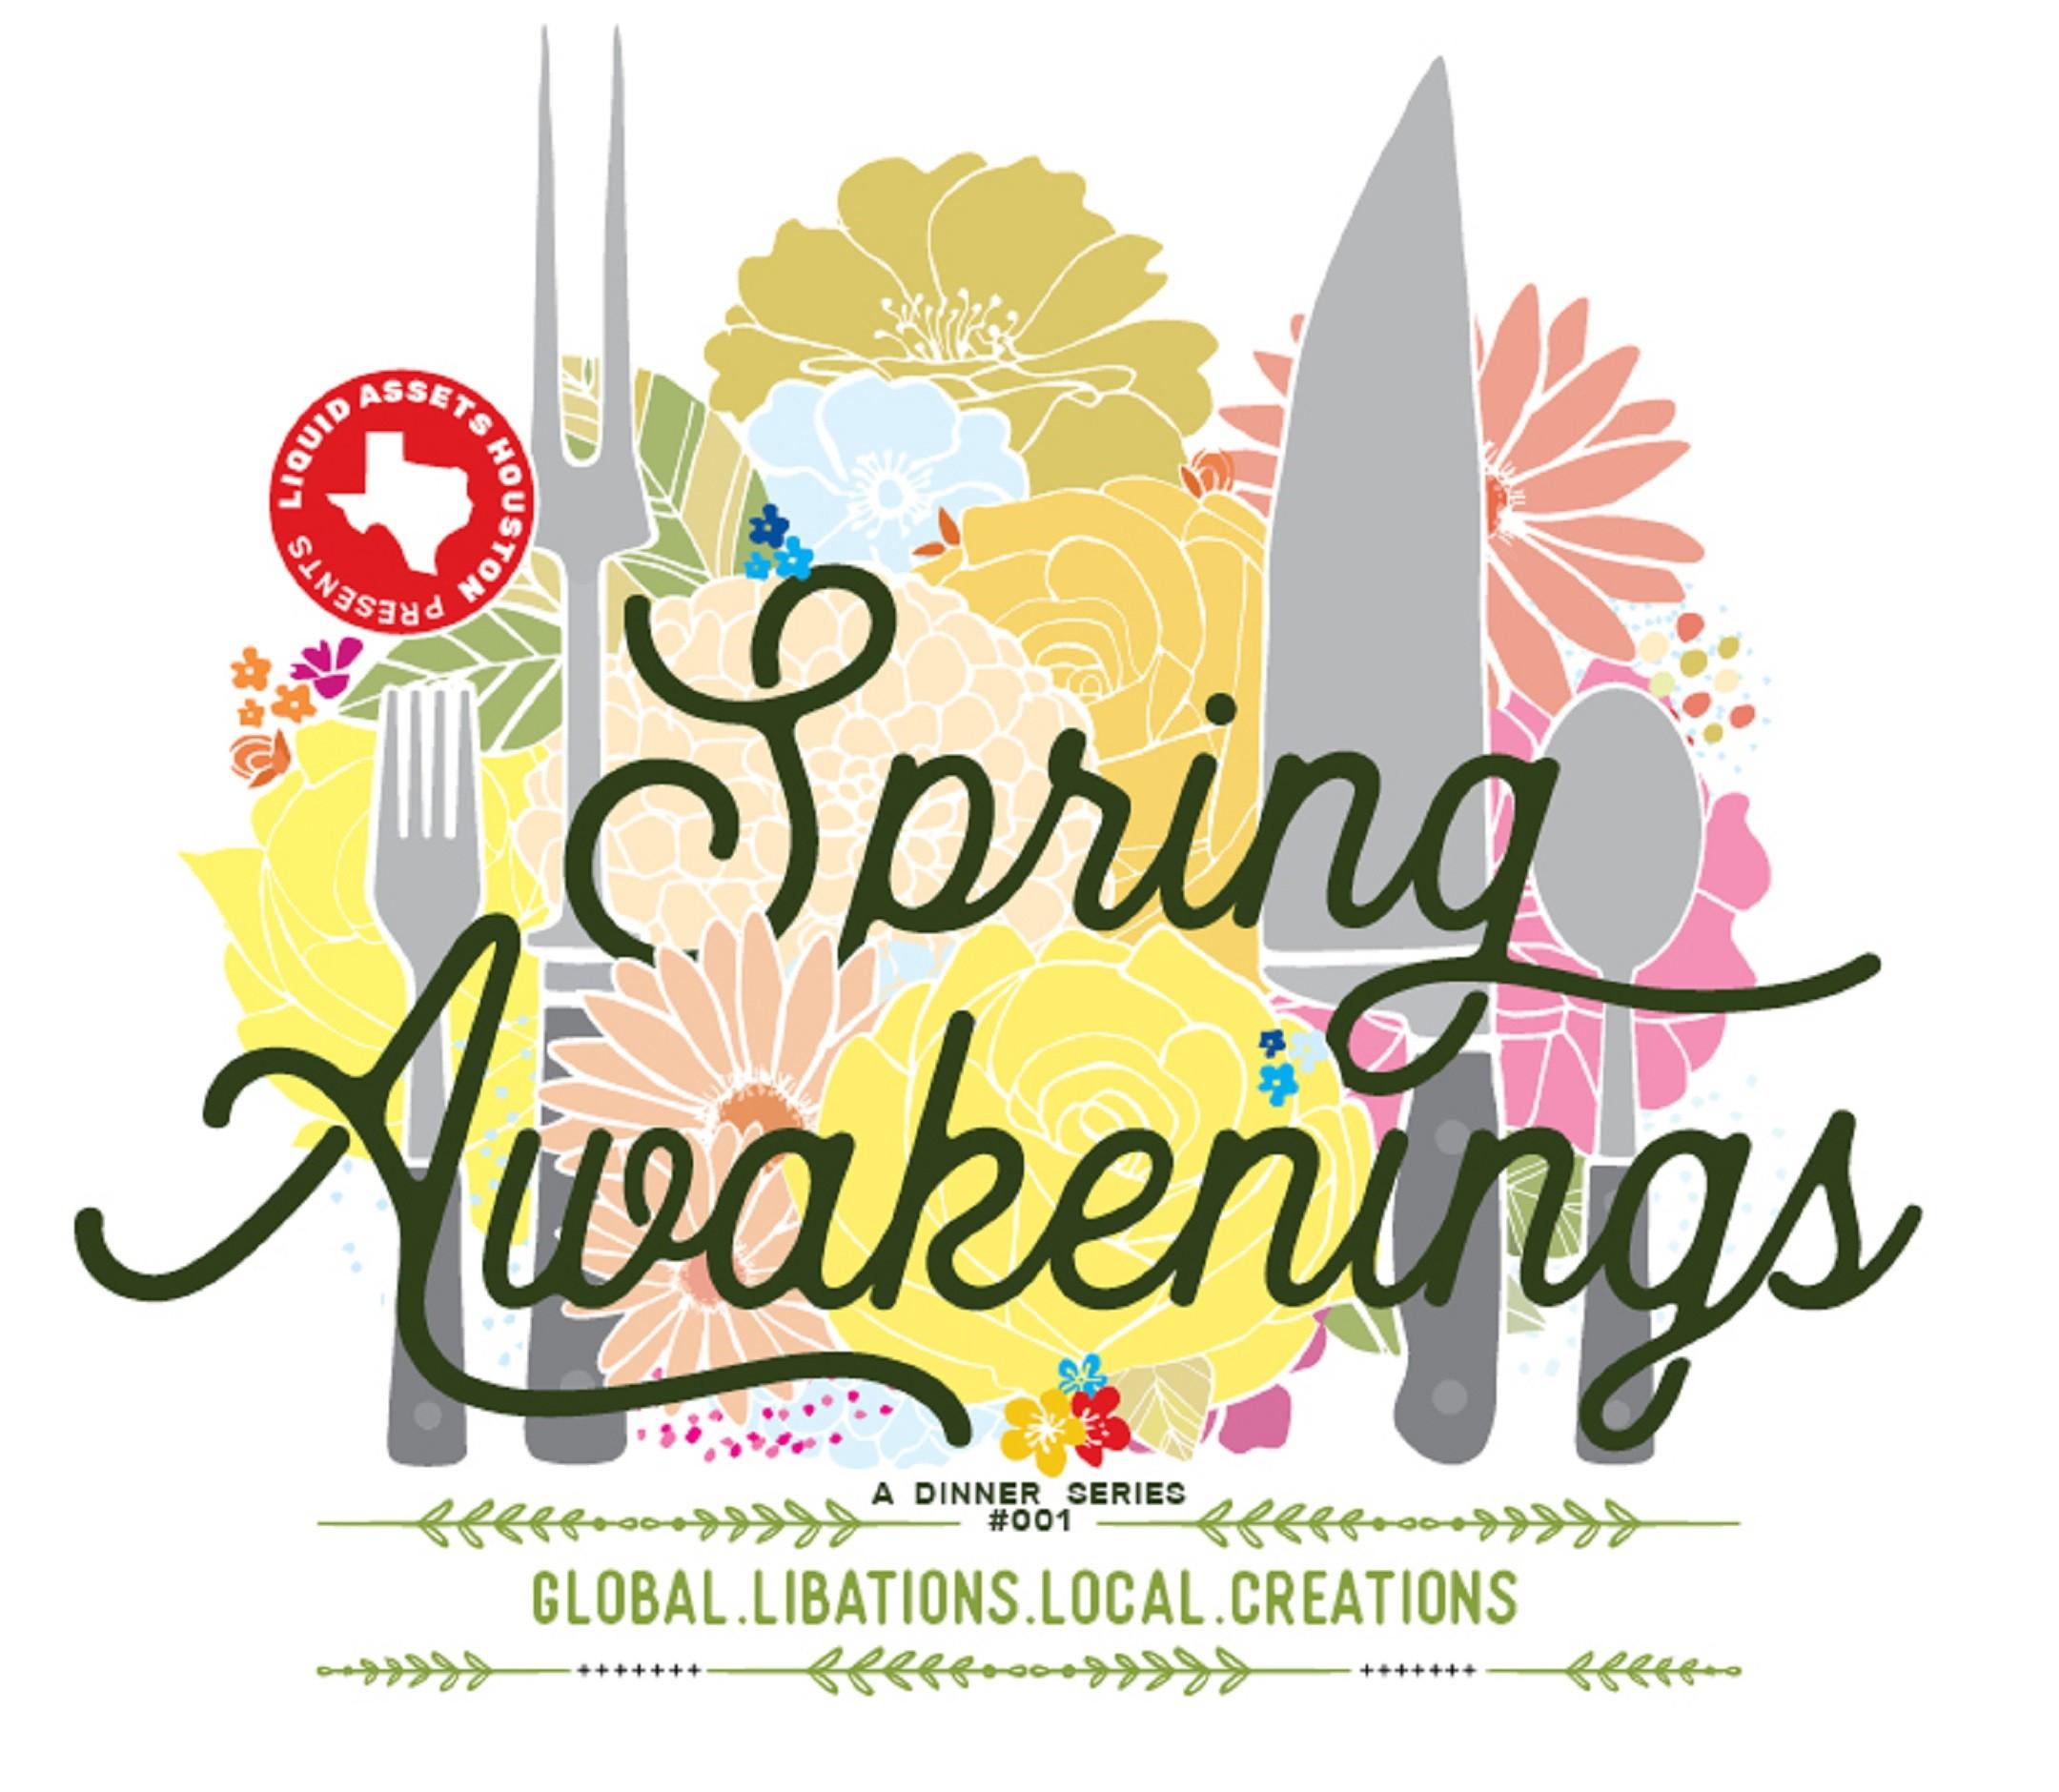 Calendar clipart team dinner Spring Washington Spring Awakenings Food